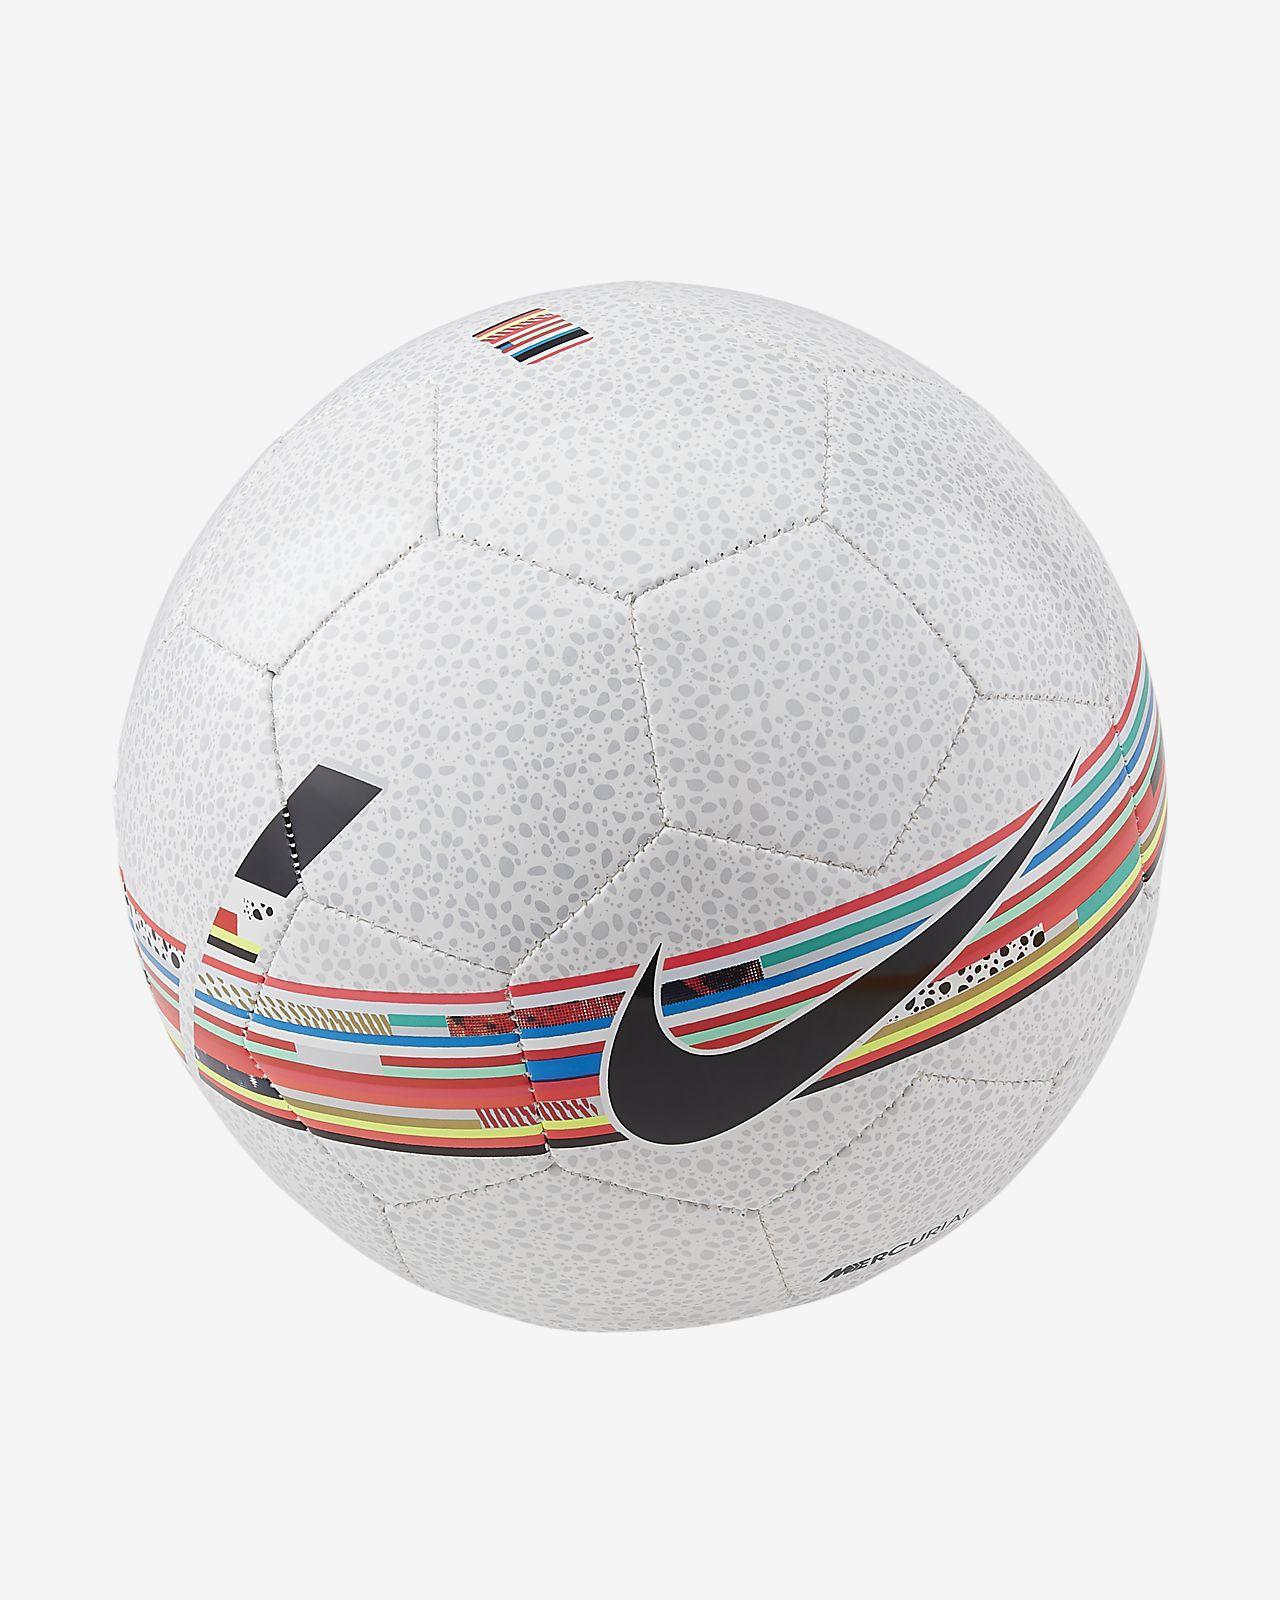 Nike Mercurial Prestige Fussball